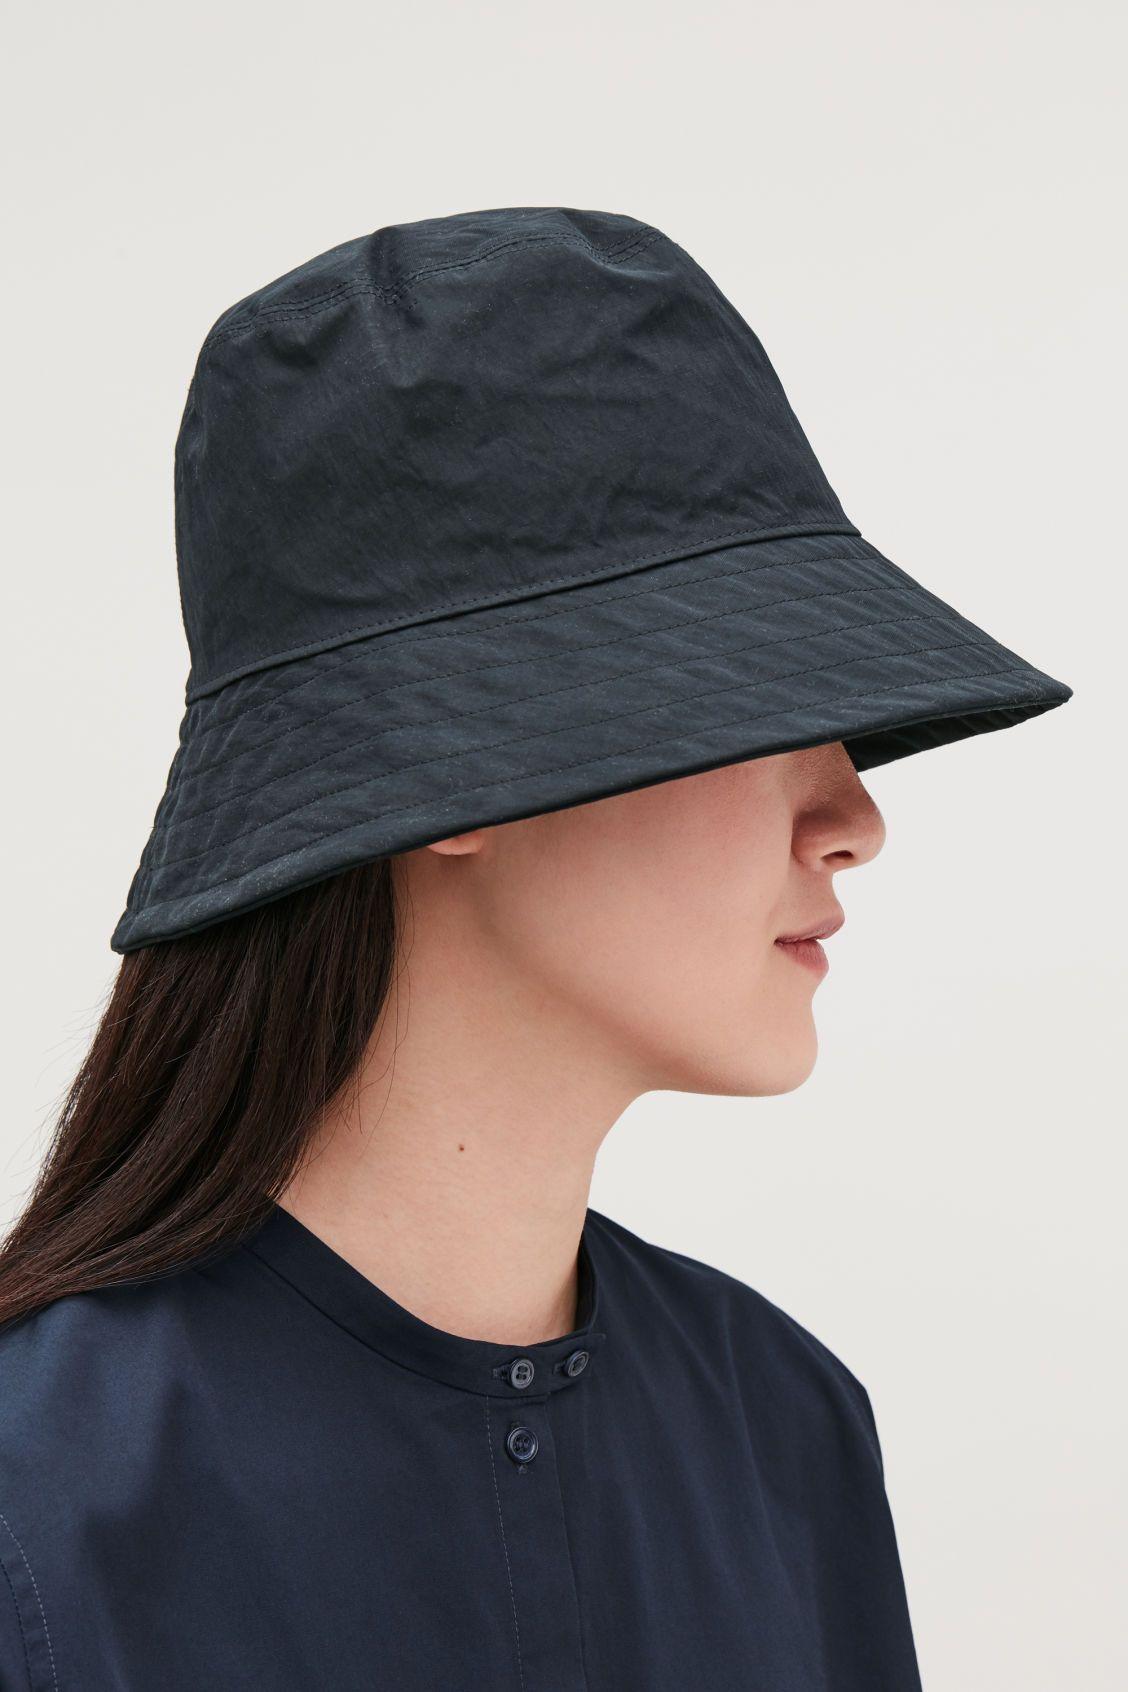 Denim Hat Fisherman Casual Lovely Hat for Wearing Children Summer Spring S